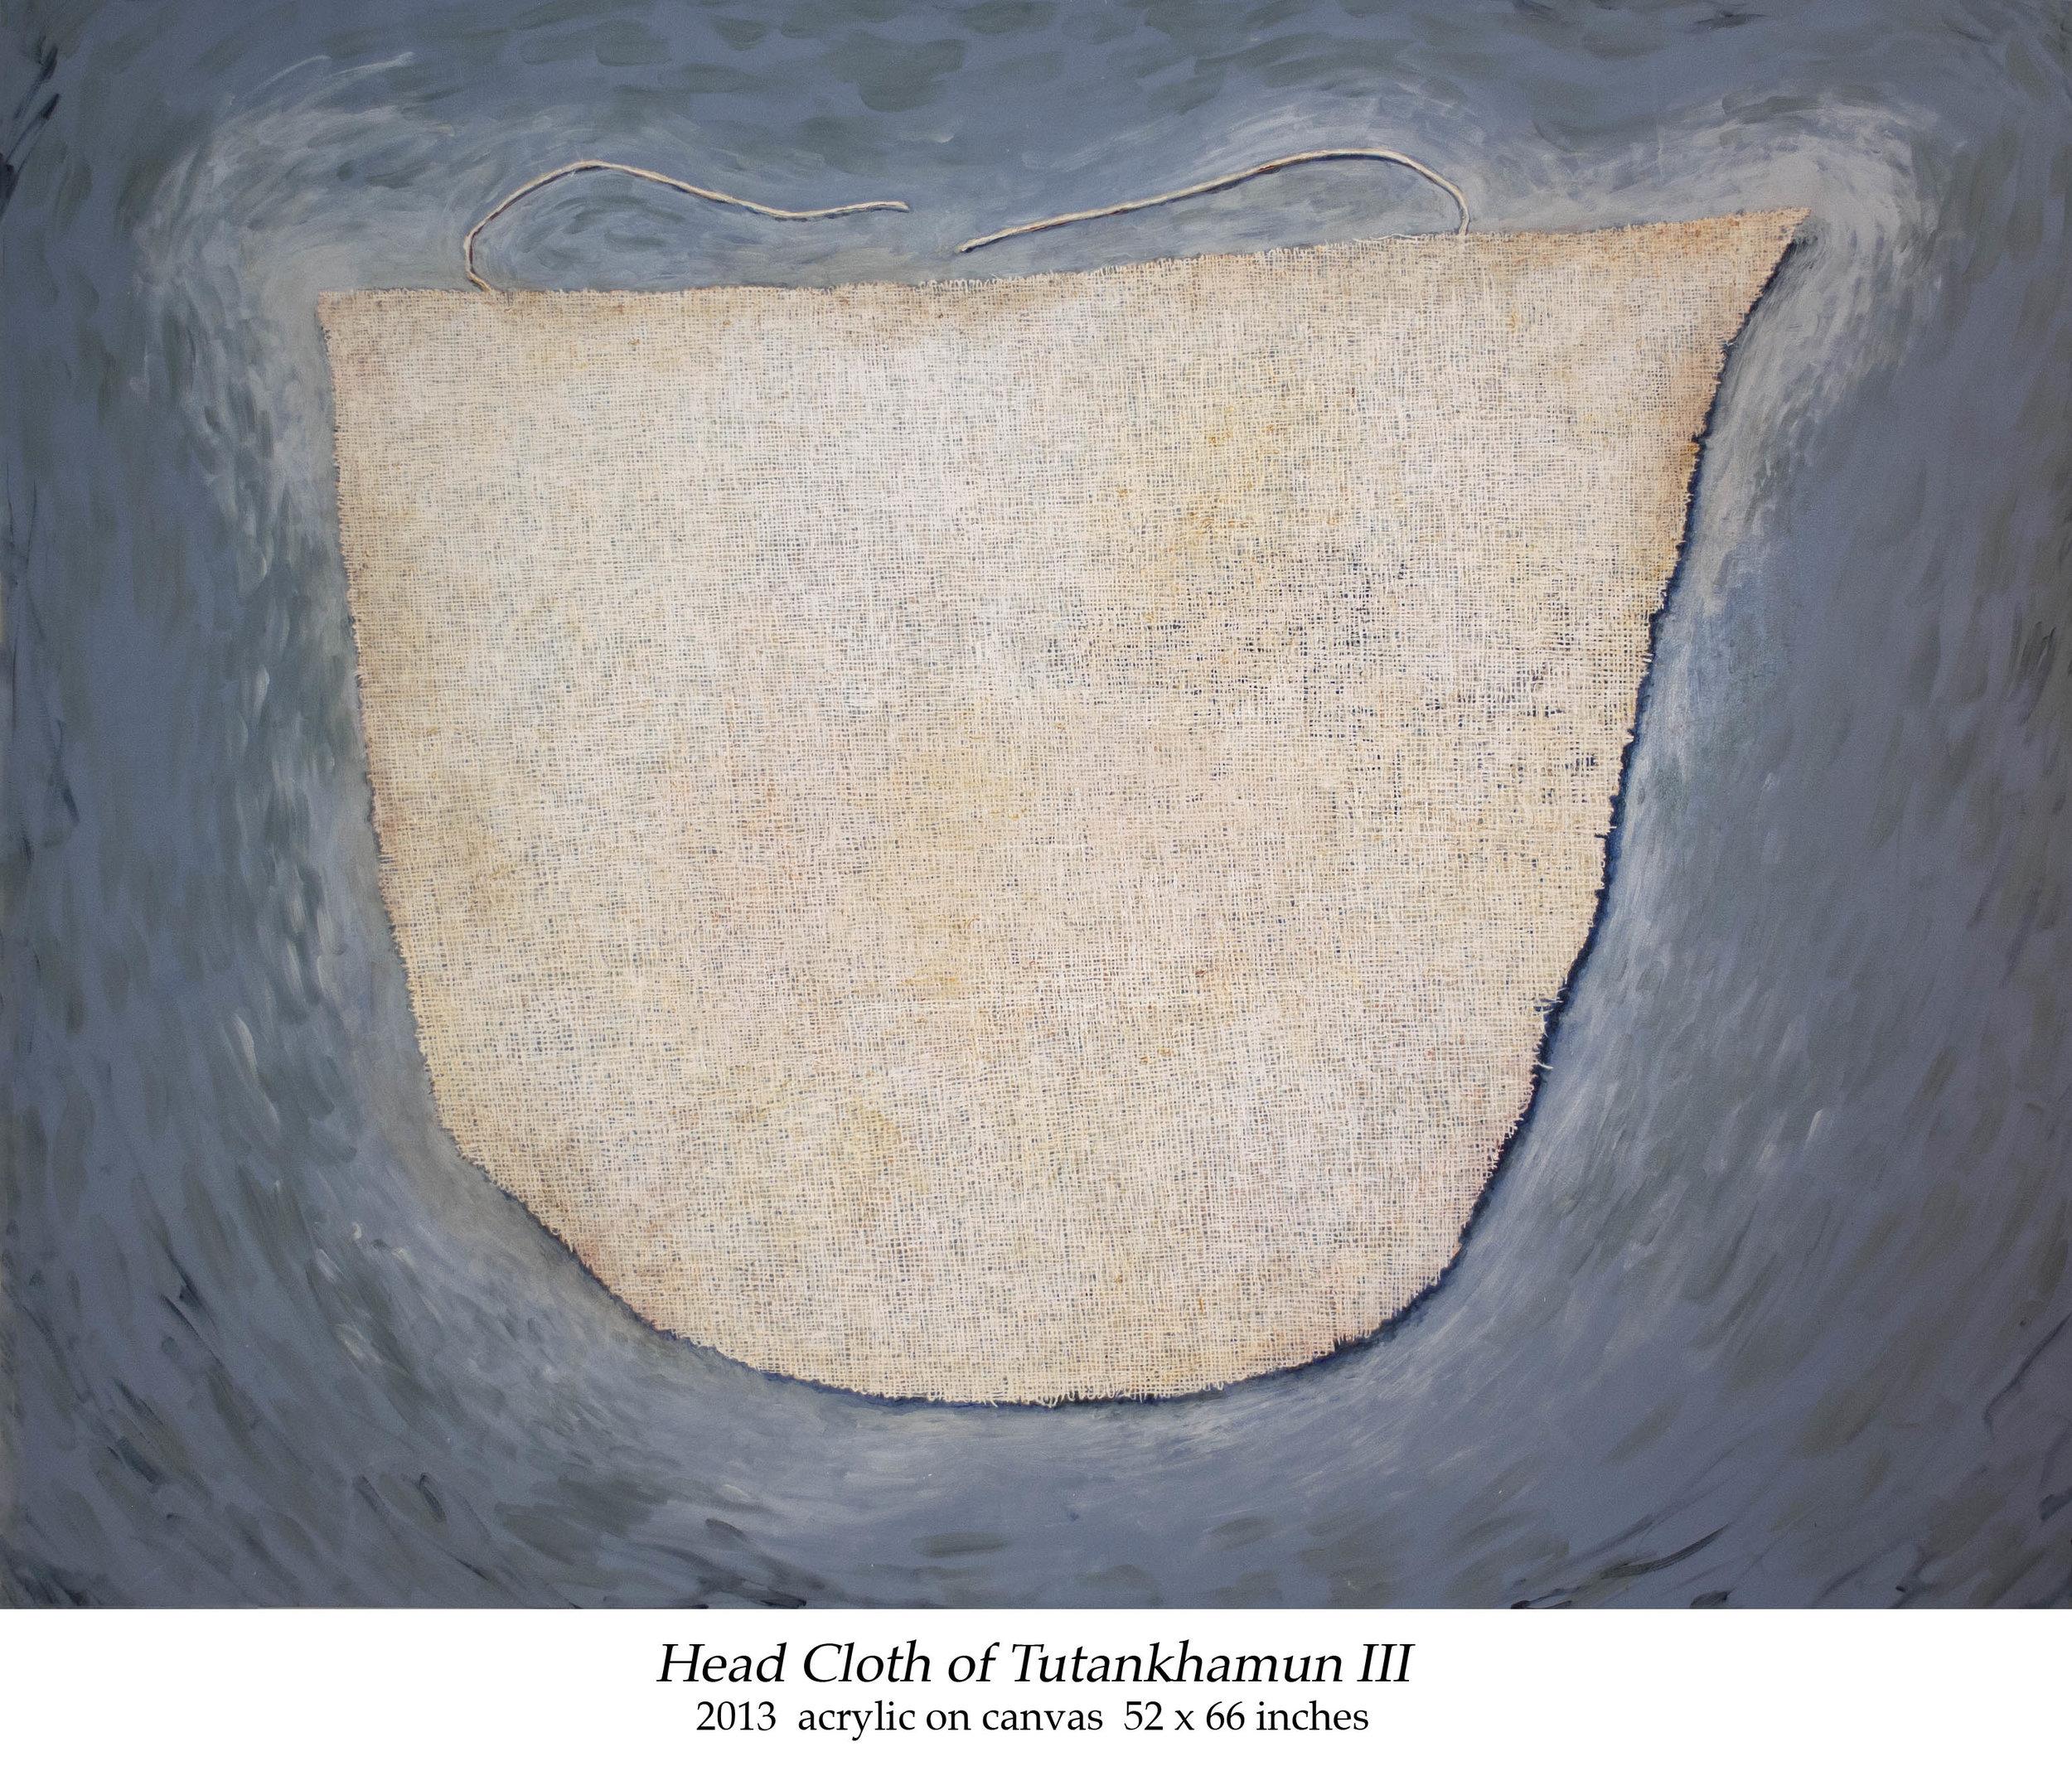 Head Cloth of Tutankhamun III 2013 acrylic on canvas 52 x 66 inches.jpg